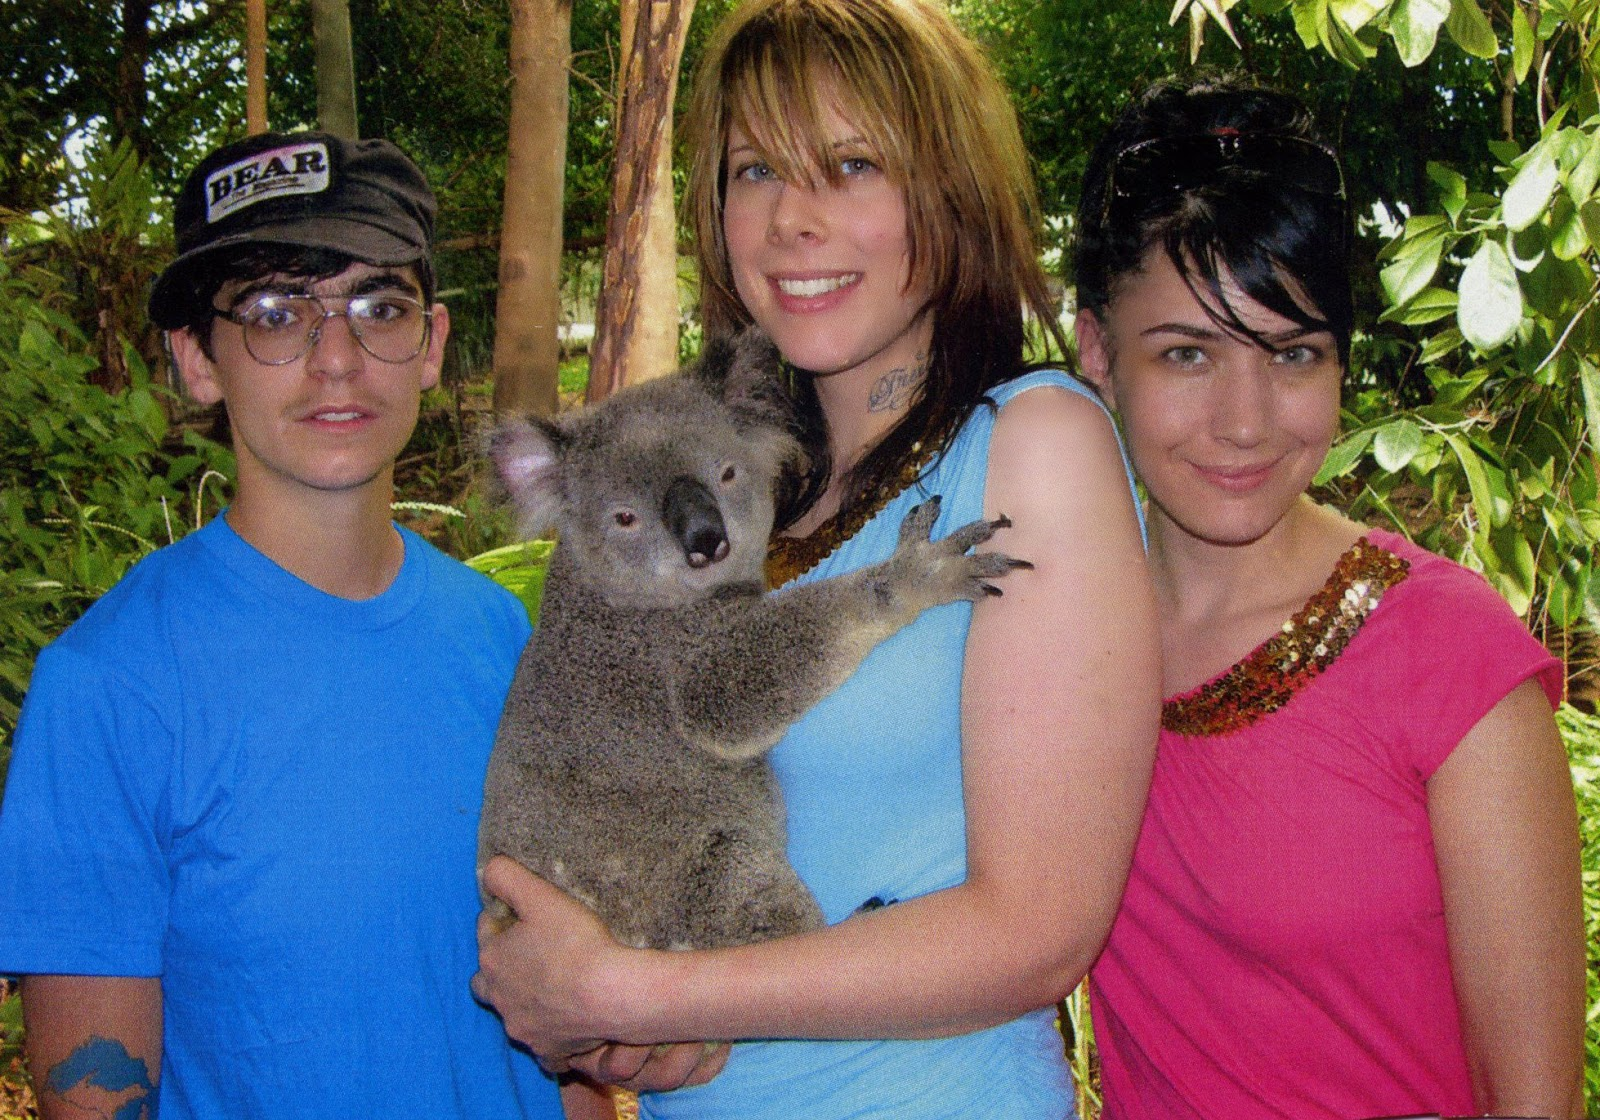 Le Tigre with a Koala